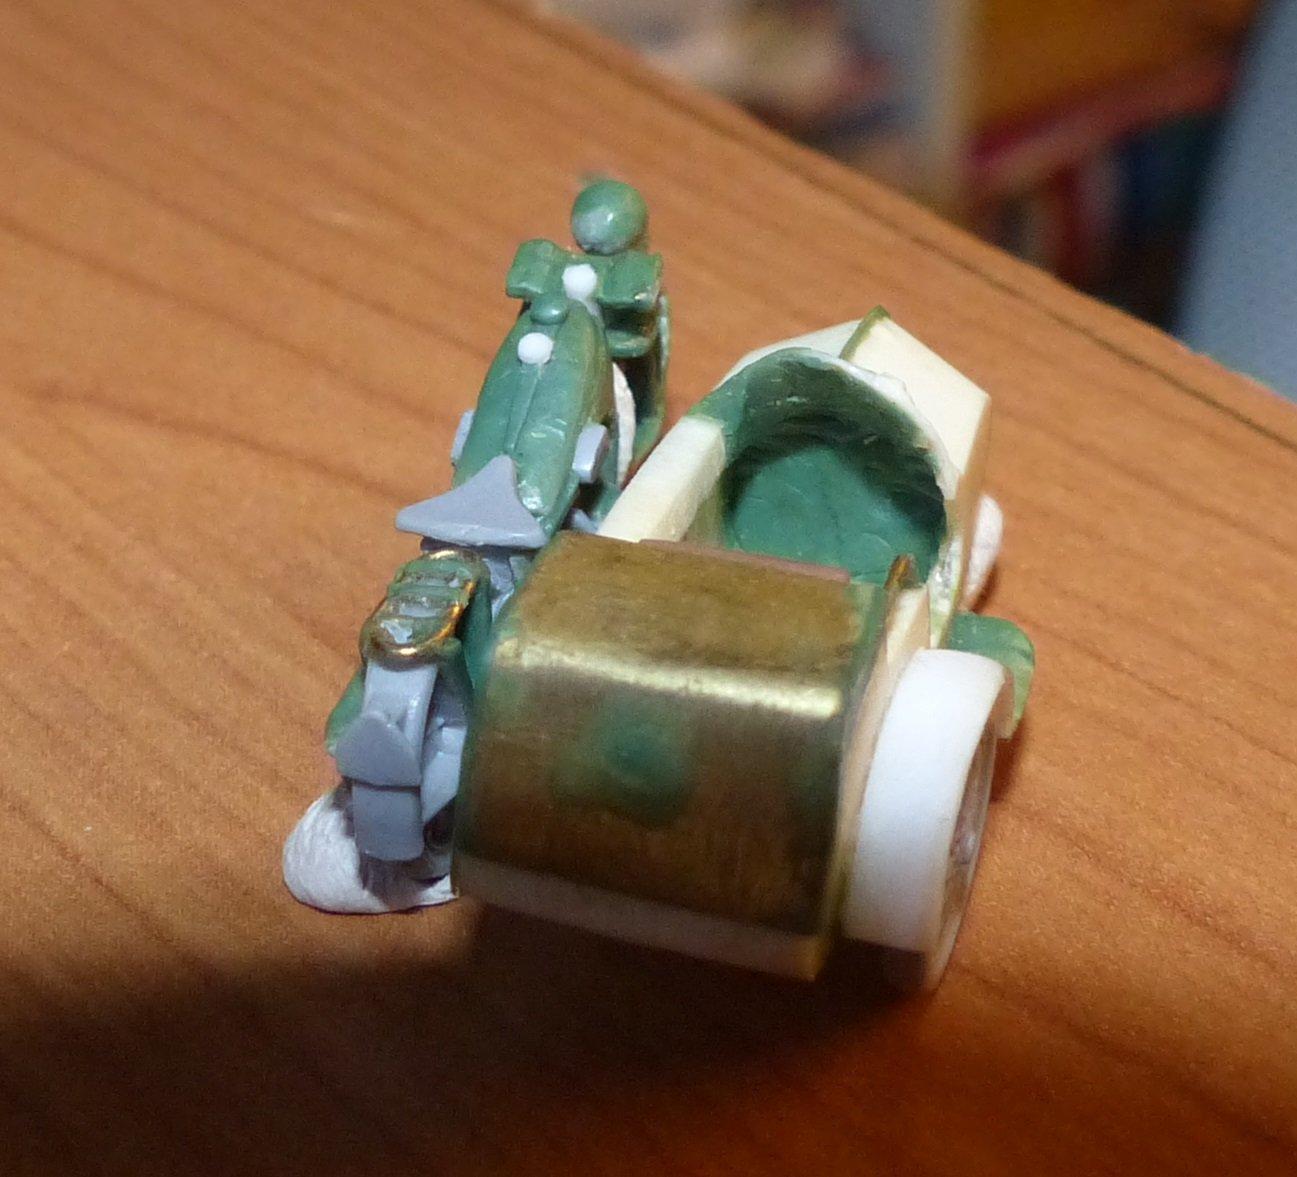 projet side car 1/72 gnome rhône retrokit france 201228032919528741